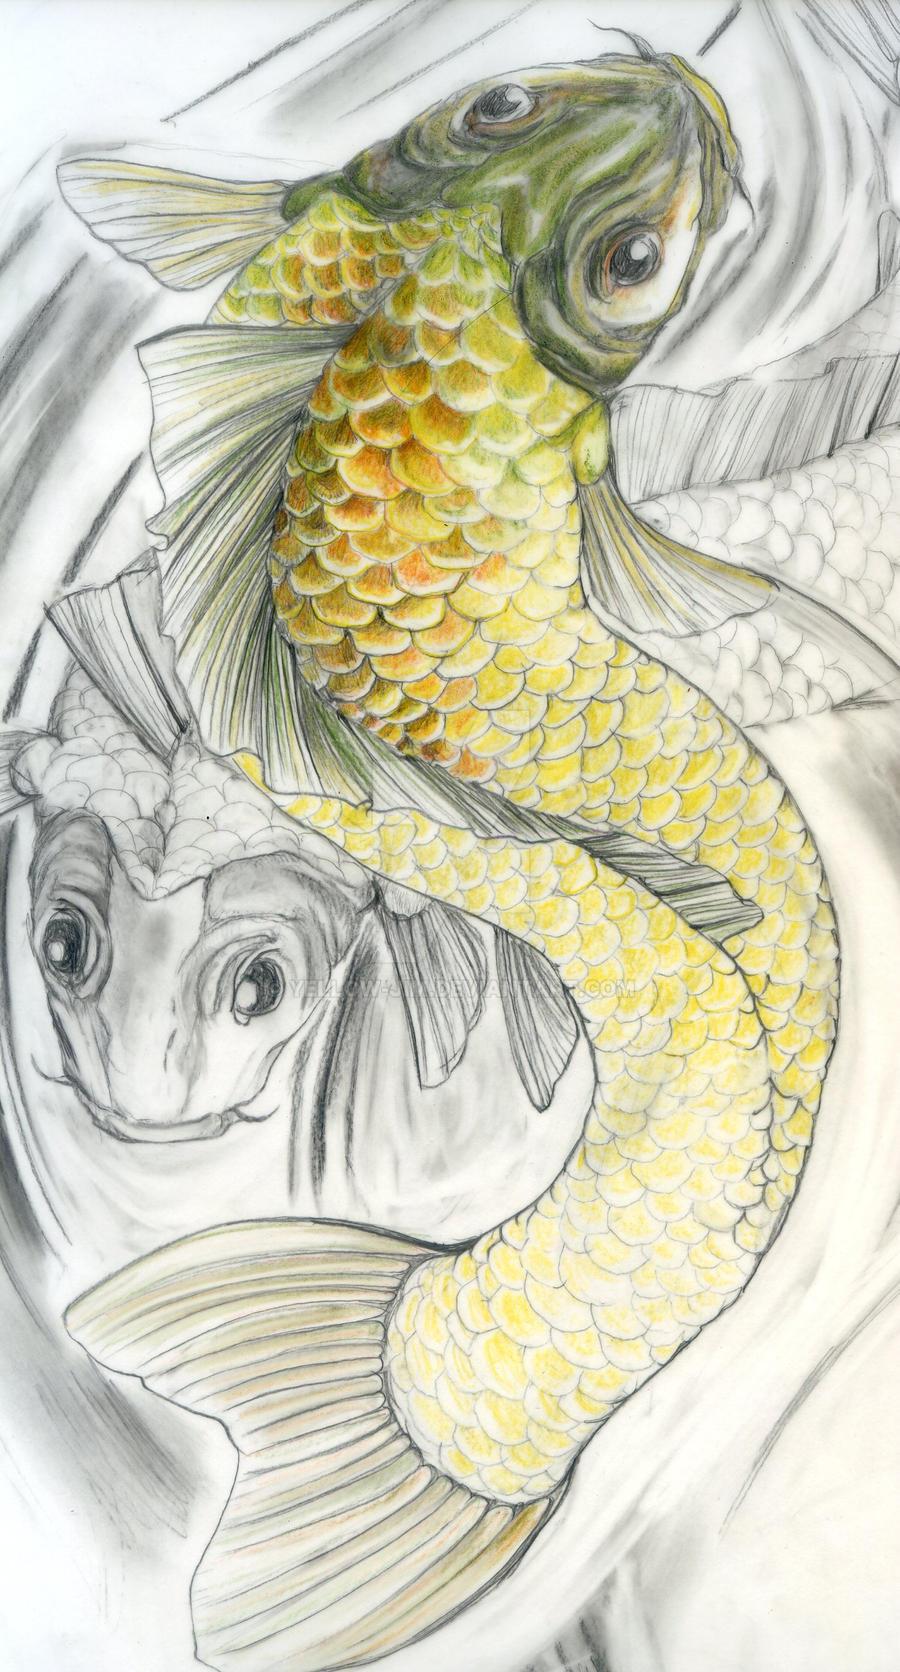 Koi carp by yellow jim on deviantart for Koi zot i mange zordi